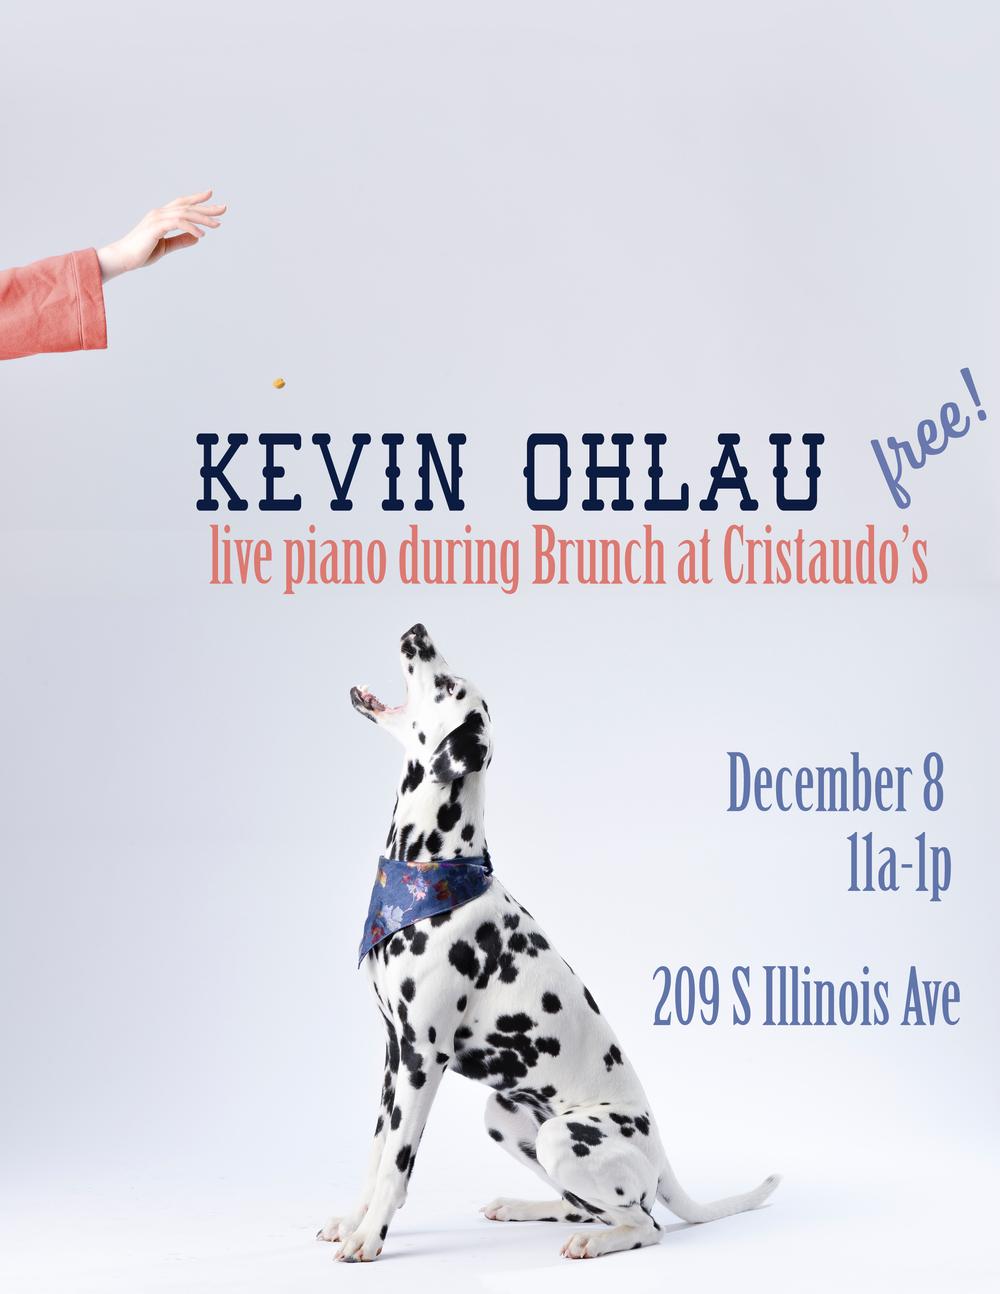 Kevin Ohlau